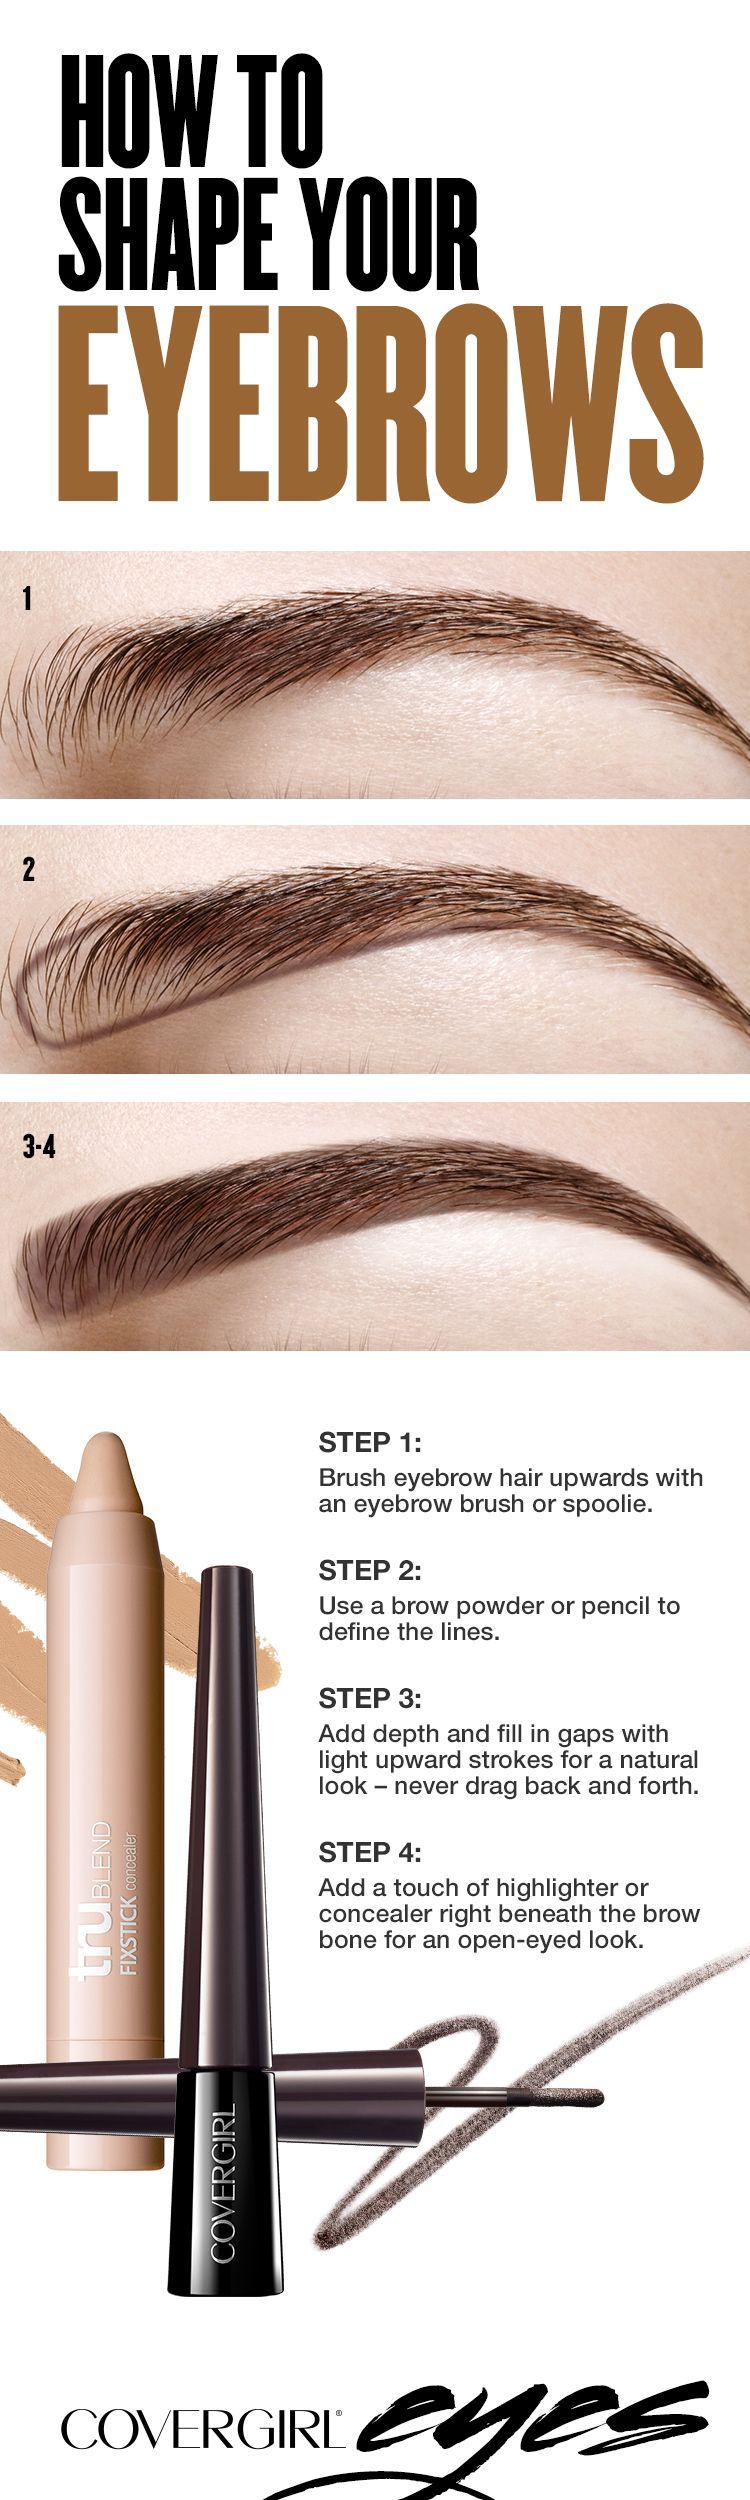 A tratar se ha dicho maquillaje pinterest bold eyebrows brow